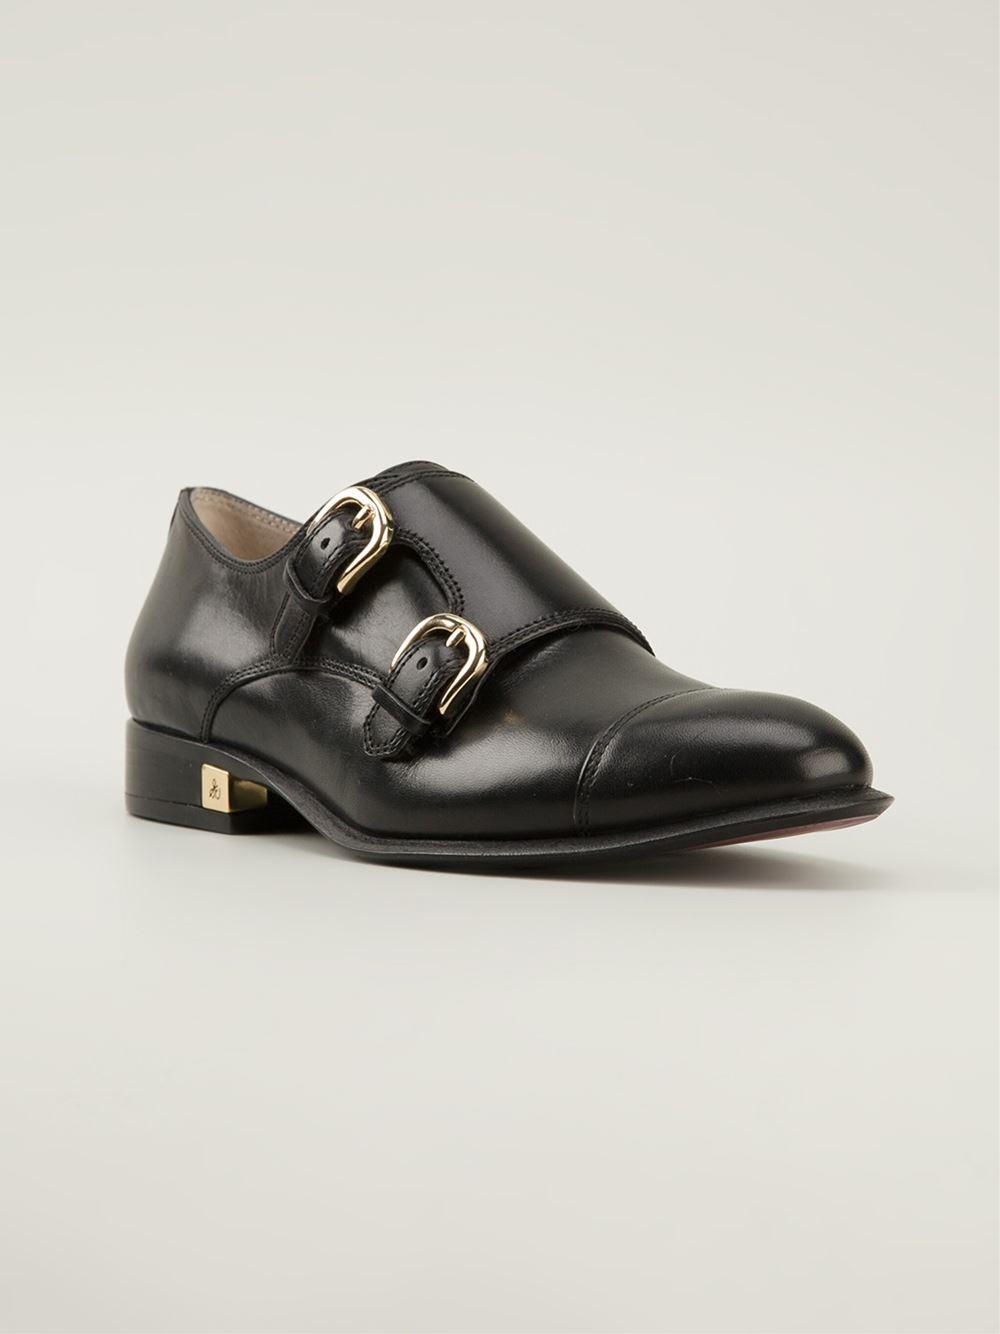 The Rock Khakis Black Shoes